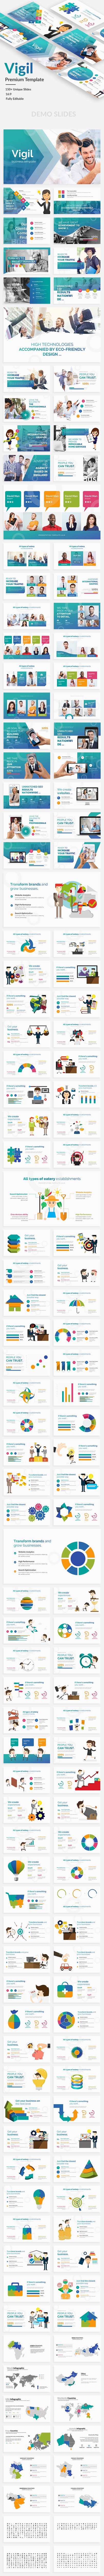 Vigil Business Premium Powerpoint Template - Business PowerPoint Templates